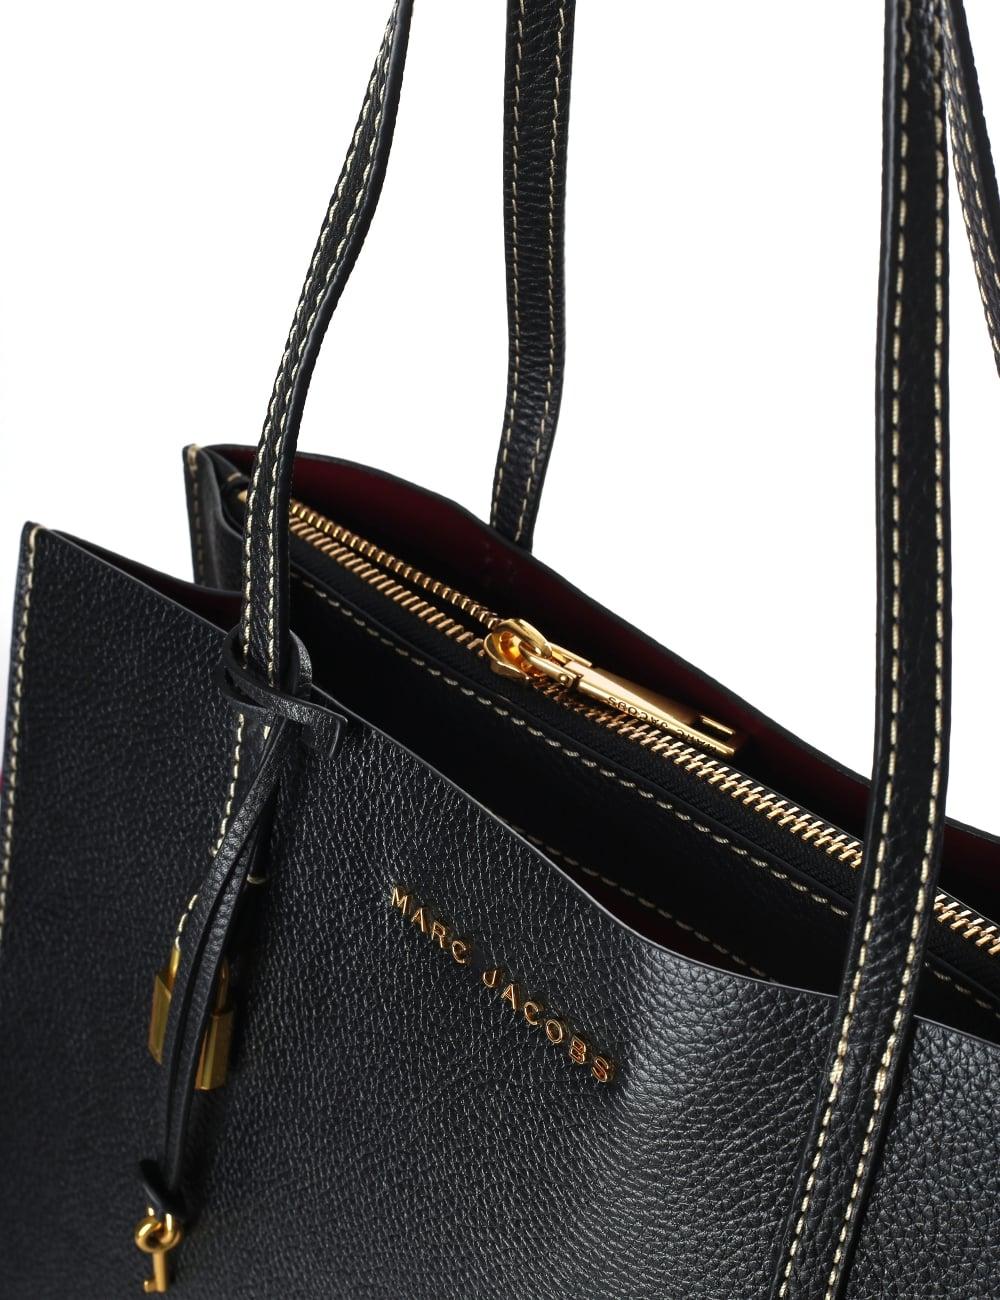 b4bfa1193c36 ... Marc Jacobs Women s The Grind Shopper Tote Bag. Tap image to zoom.  Women  039 s The Grind Shopper ...